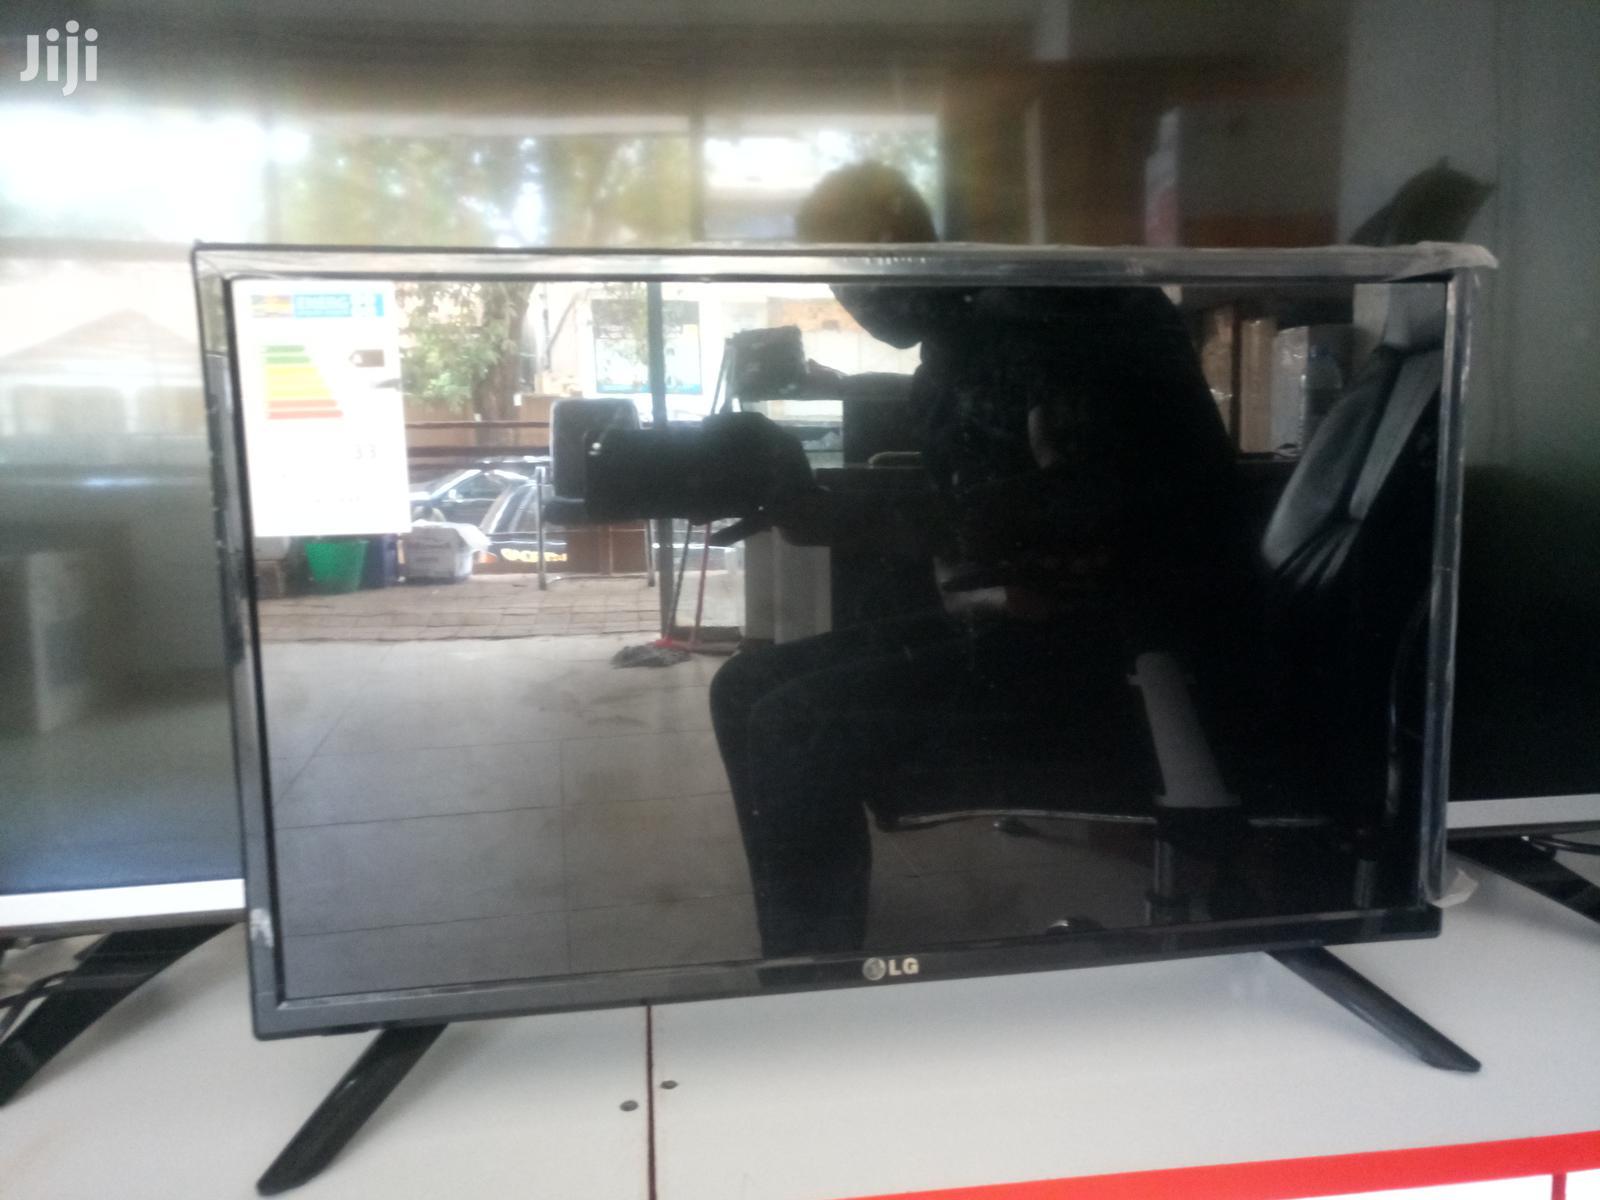 LG Led Flat Screen Digital TV 26 Inches | TV & DVD Equipment for sale in Kampala, Central Region, Uganda